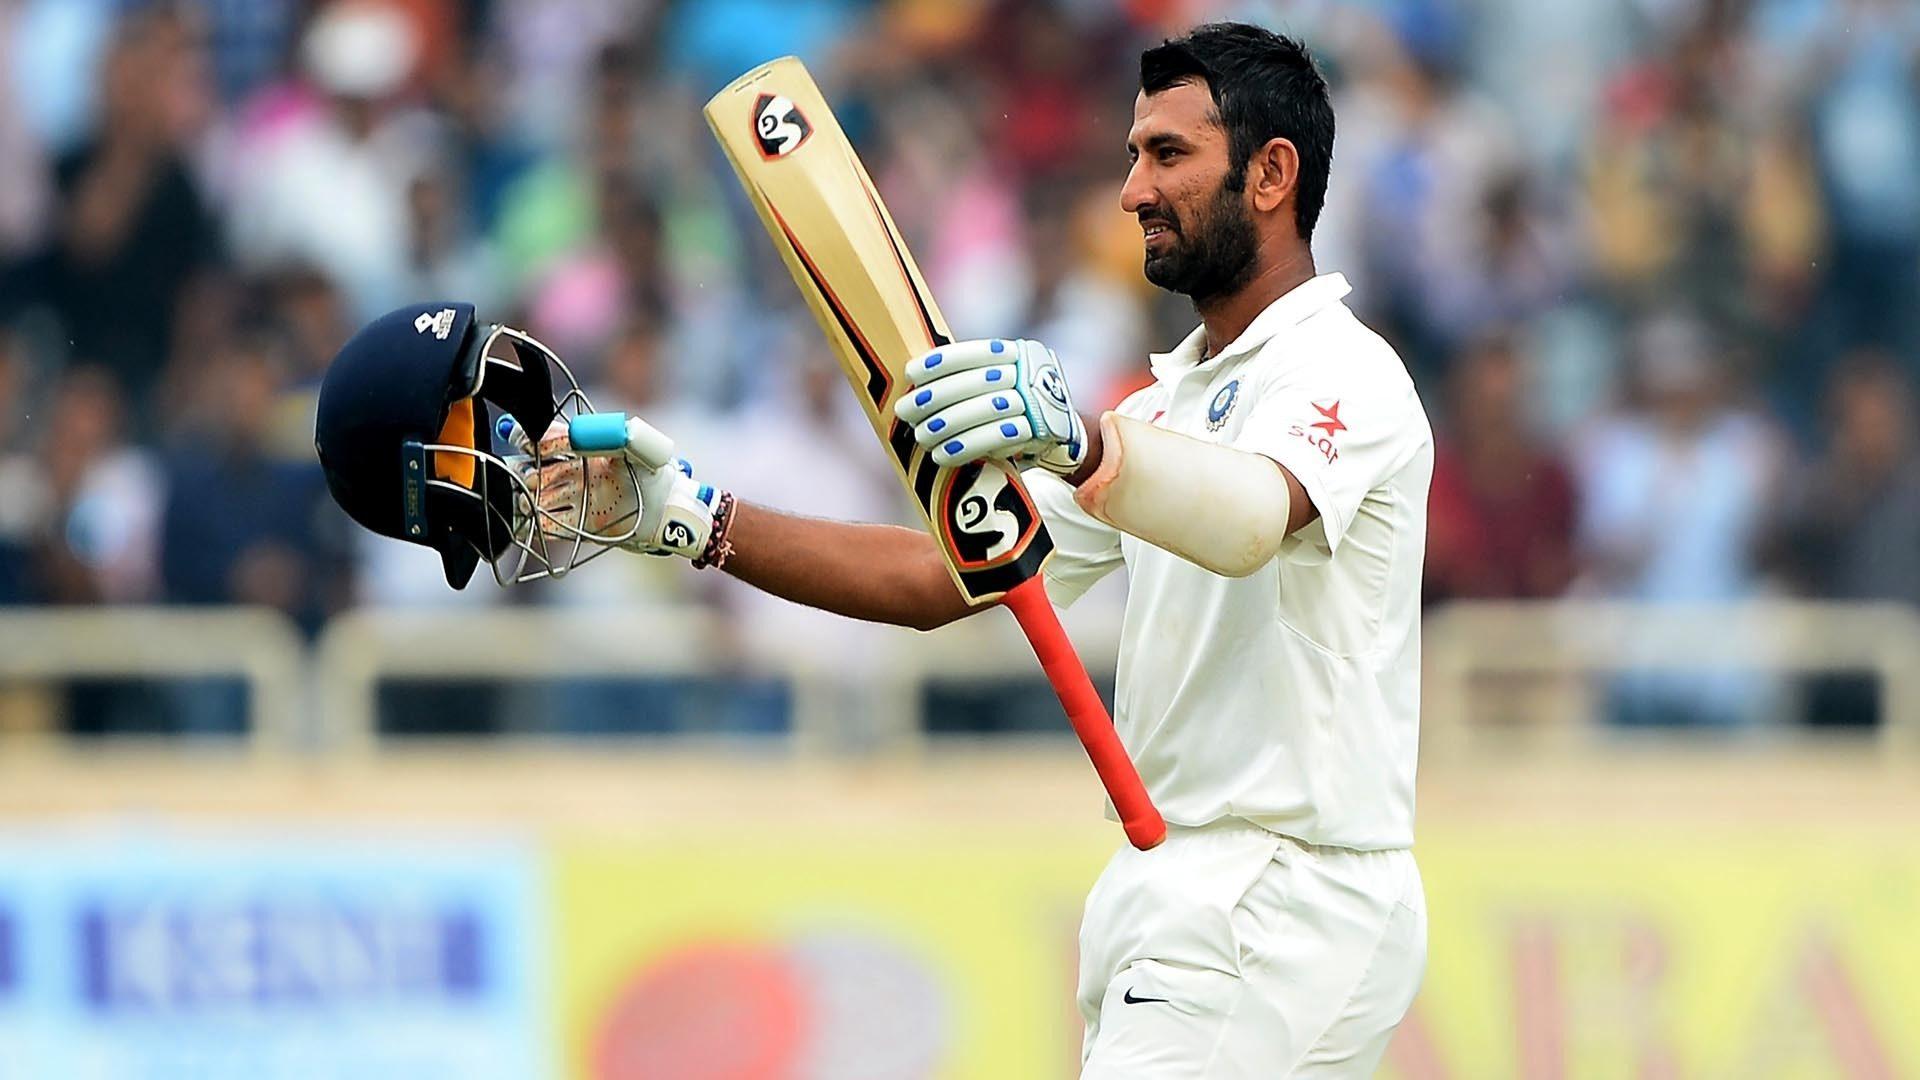 Top five Test knocks by Cheteshwar Pujara